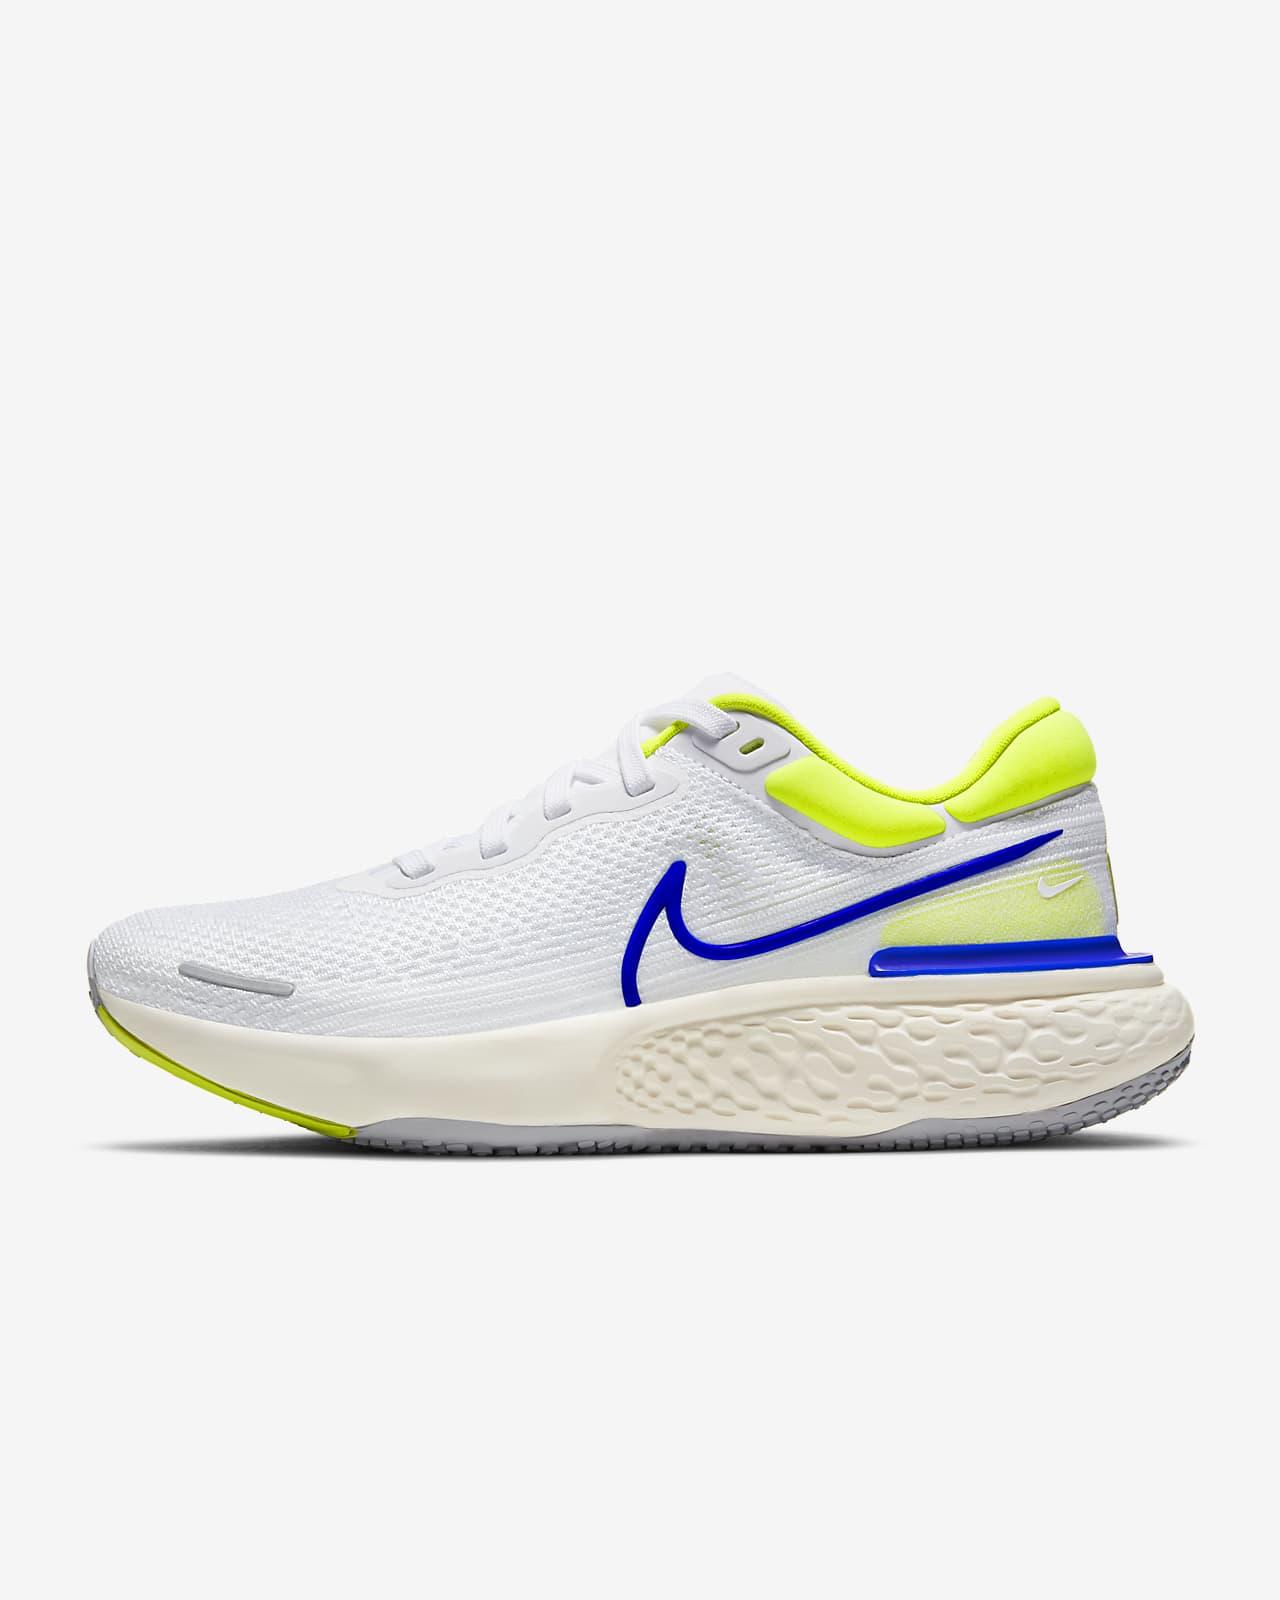 Nike ZoomX Invincible Run Flyknit 男款跑鞋